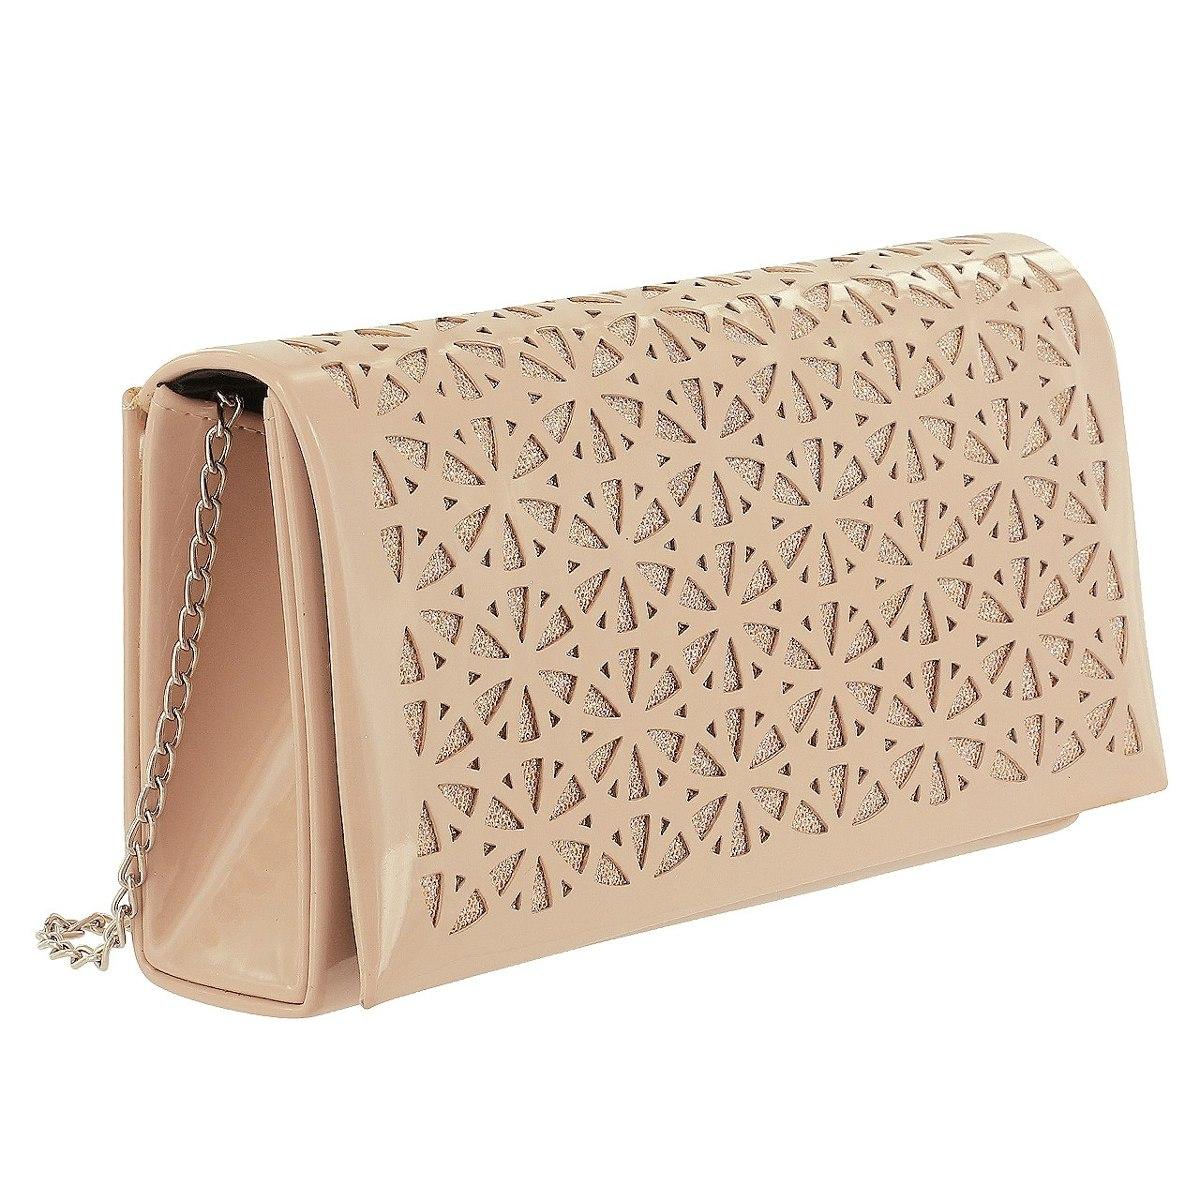 3a10bd390 Bolsa Clutch Dama Mujer De Mano Maquillaje Dorothy Gaynor - $ 499.00 ...